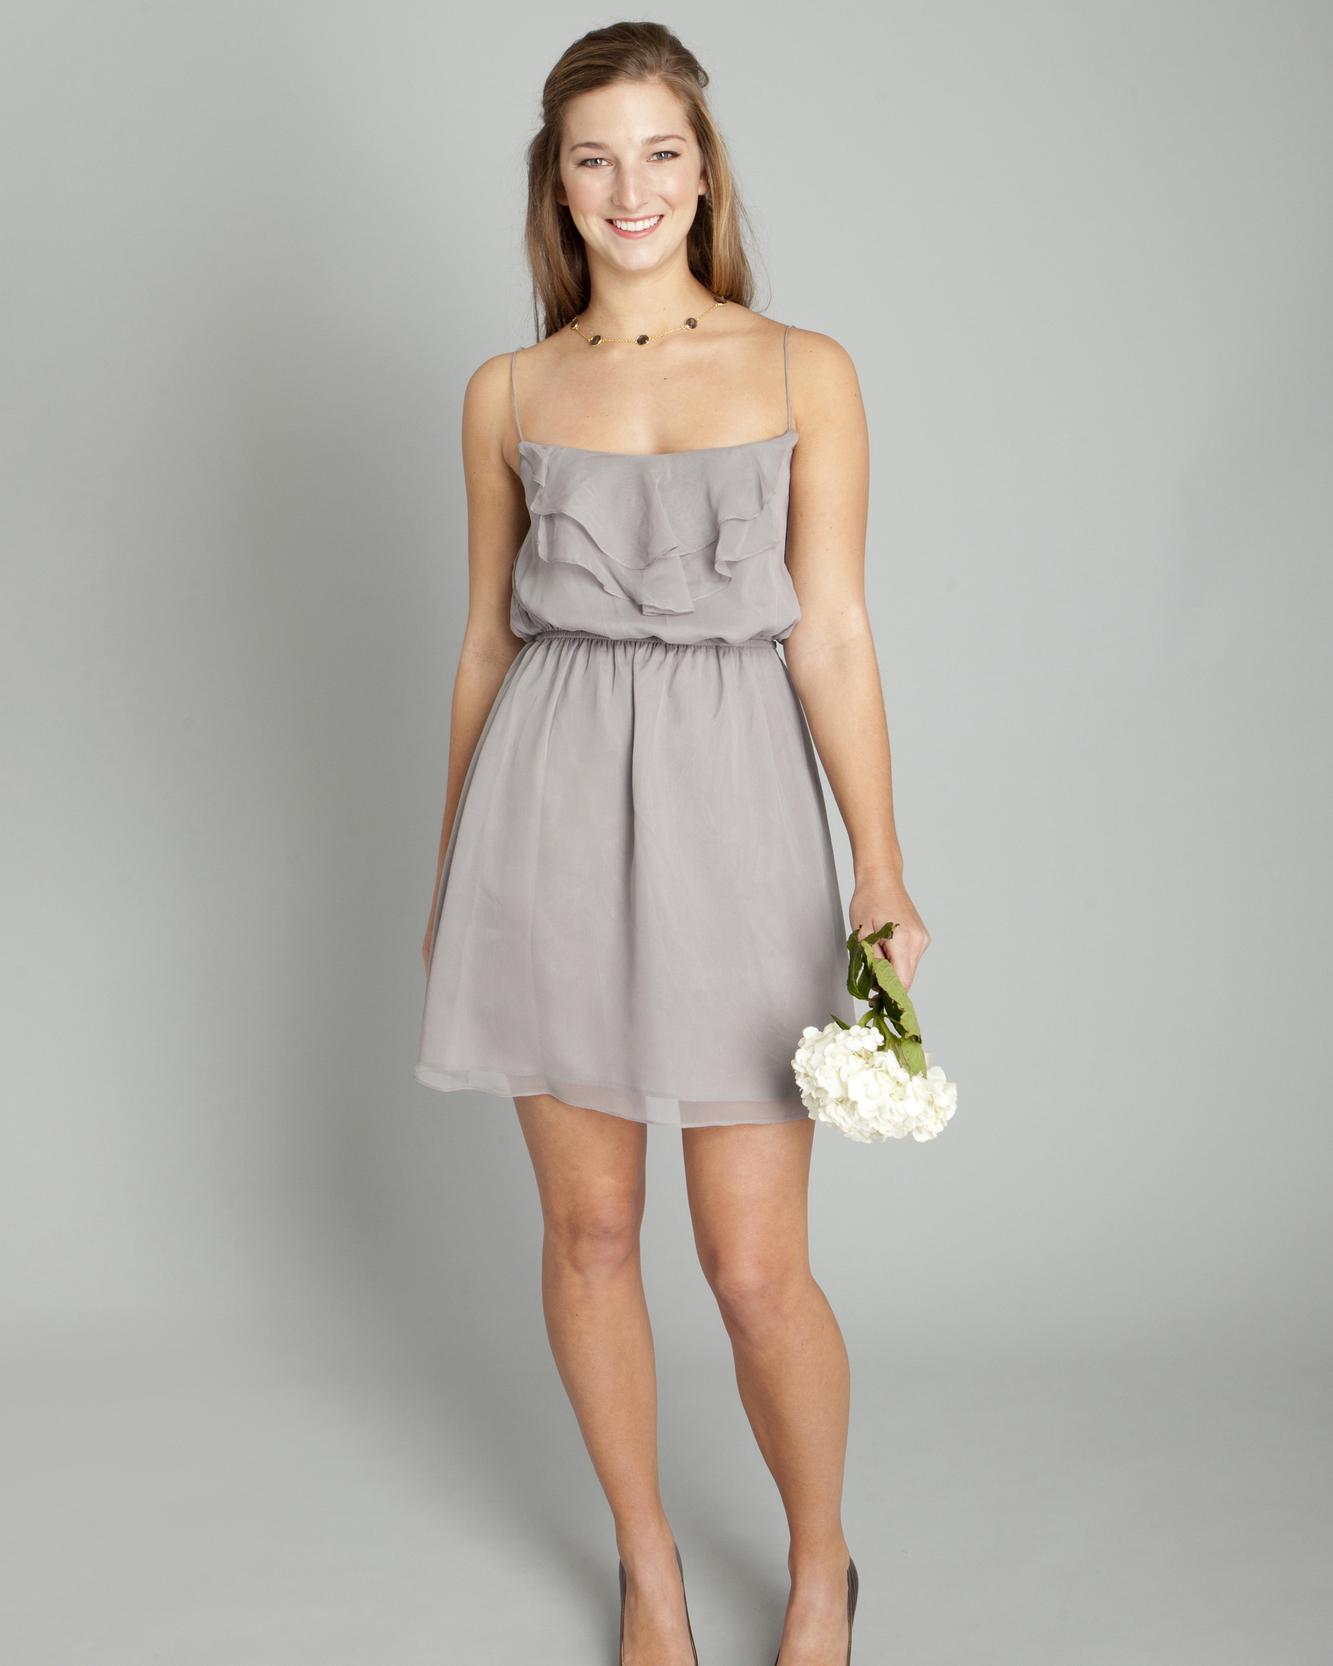 Bridesmaid Dresses for Beach Weddings